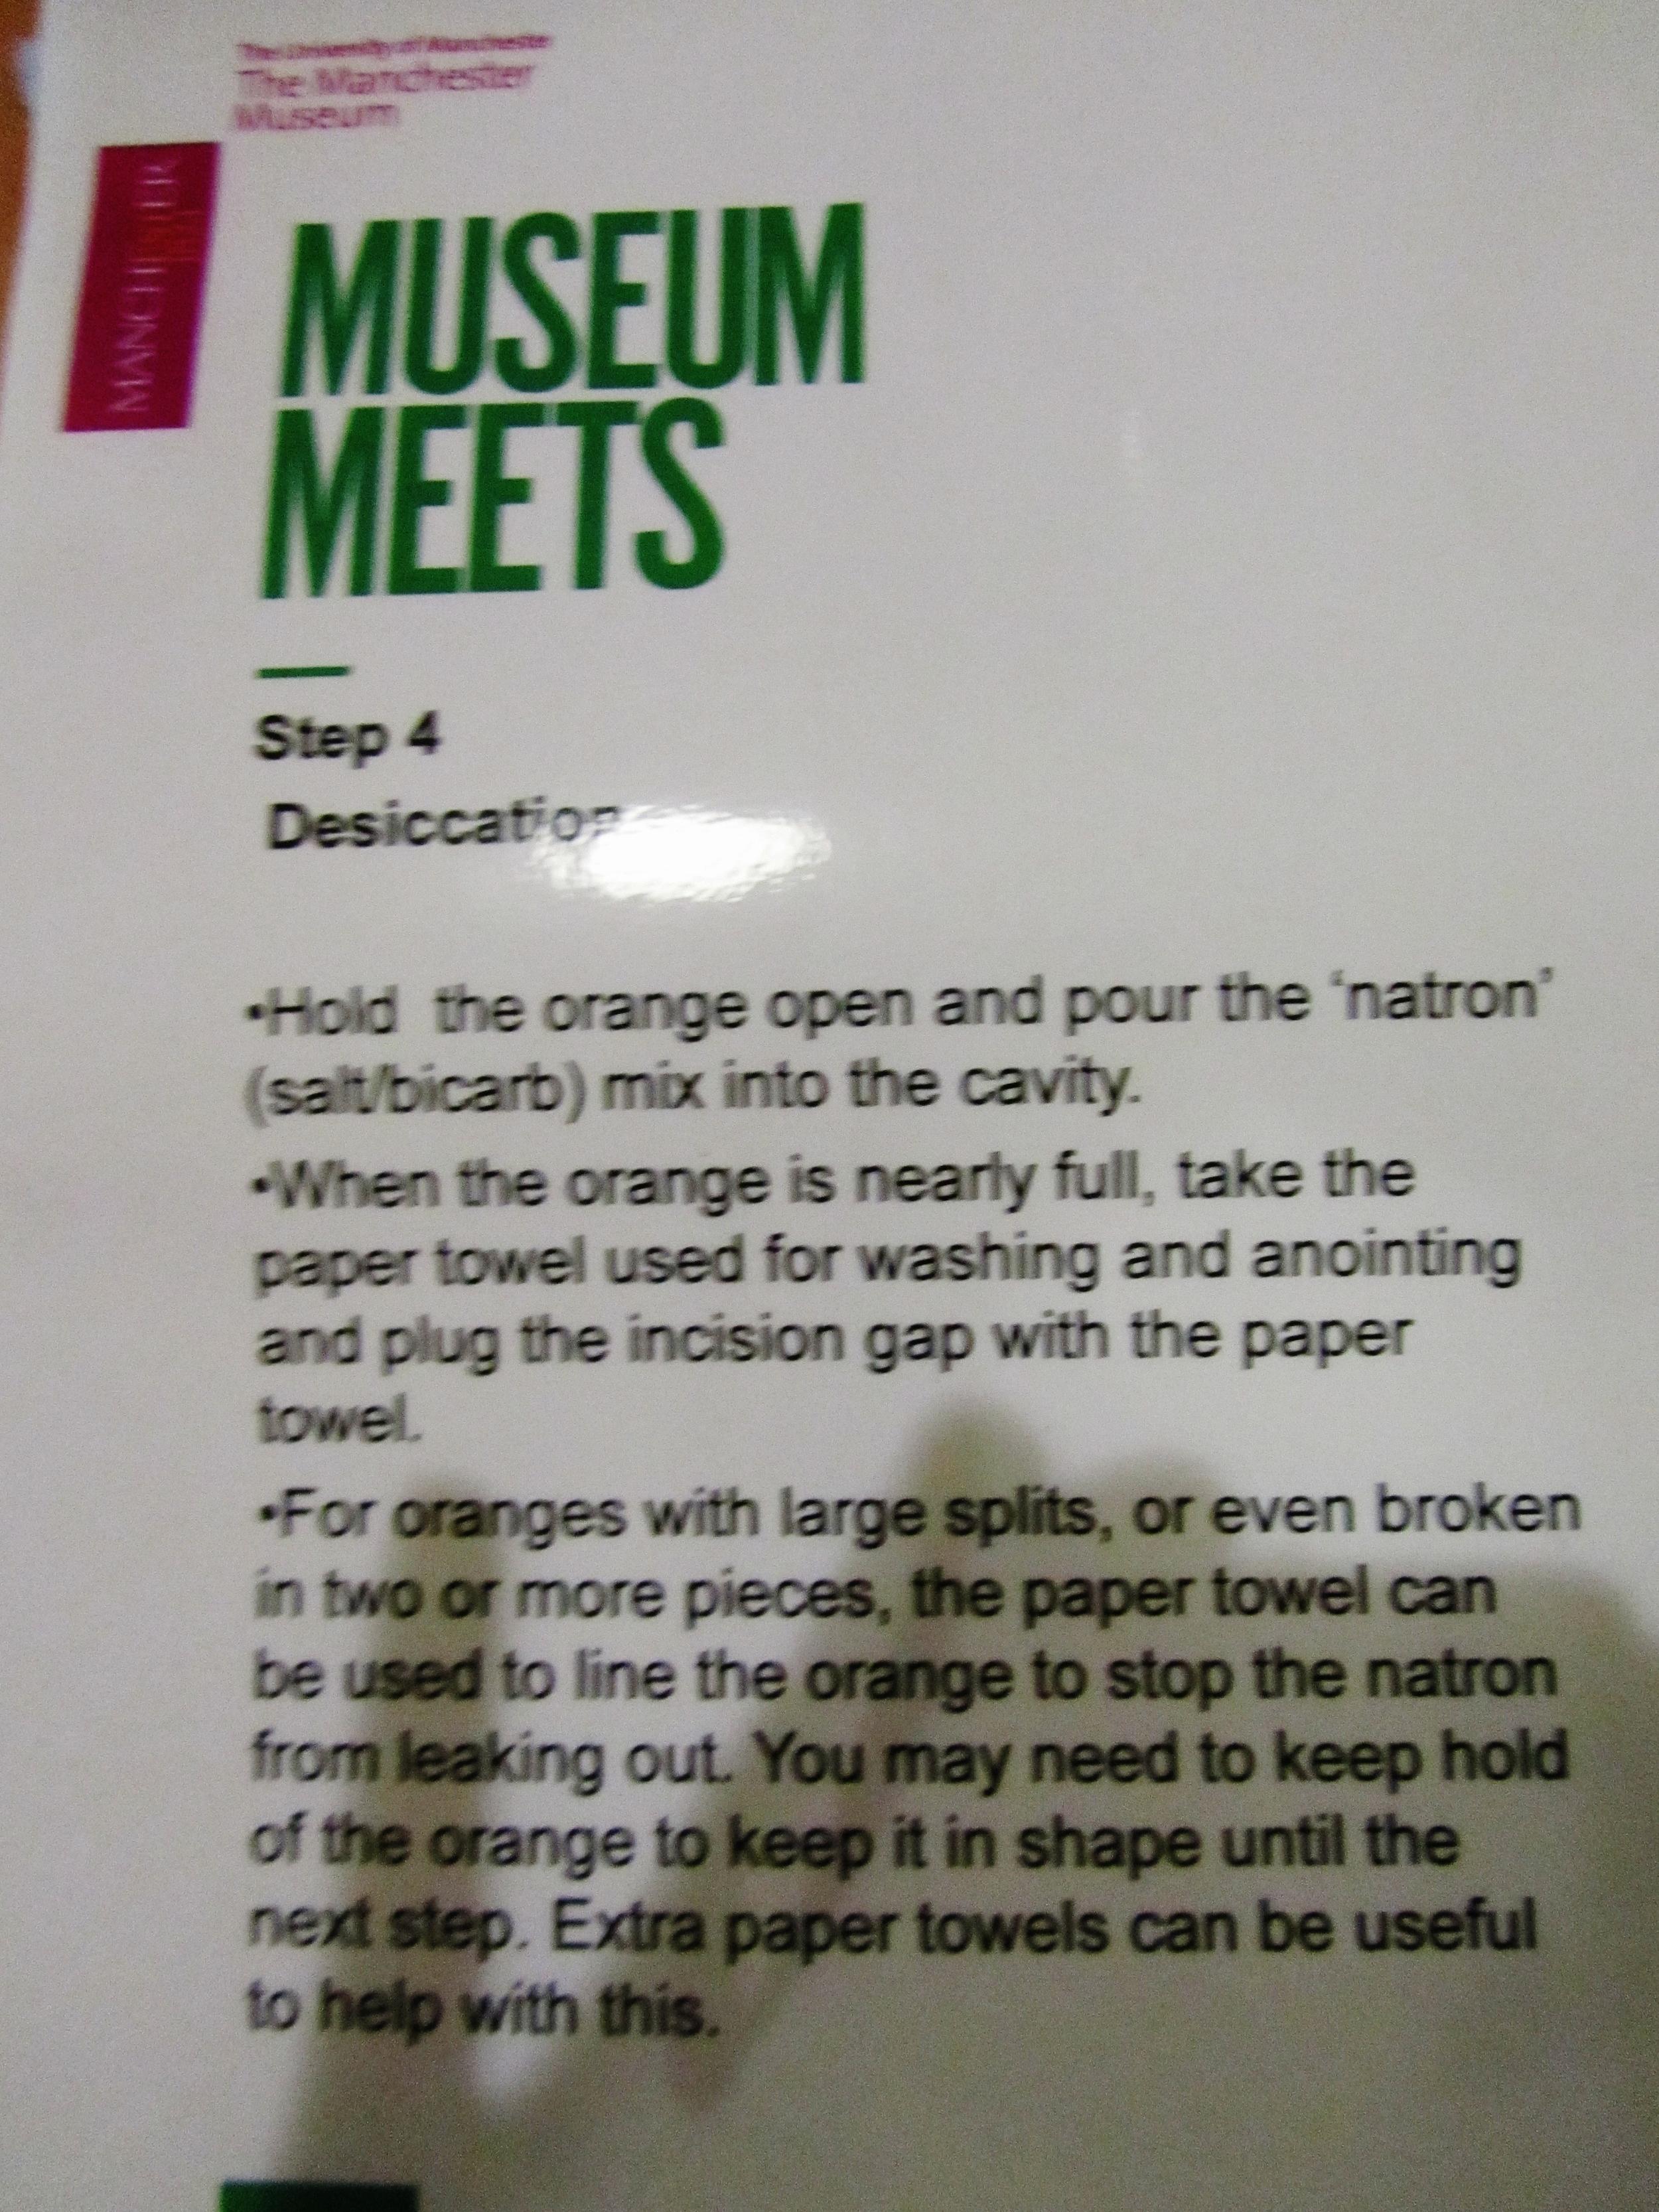 after hours manchester museum step 4 mummifying orange dessication.JPG